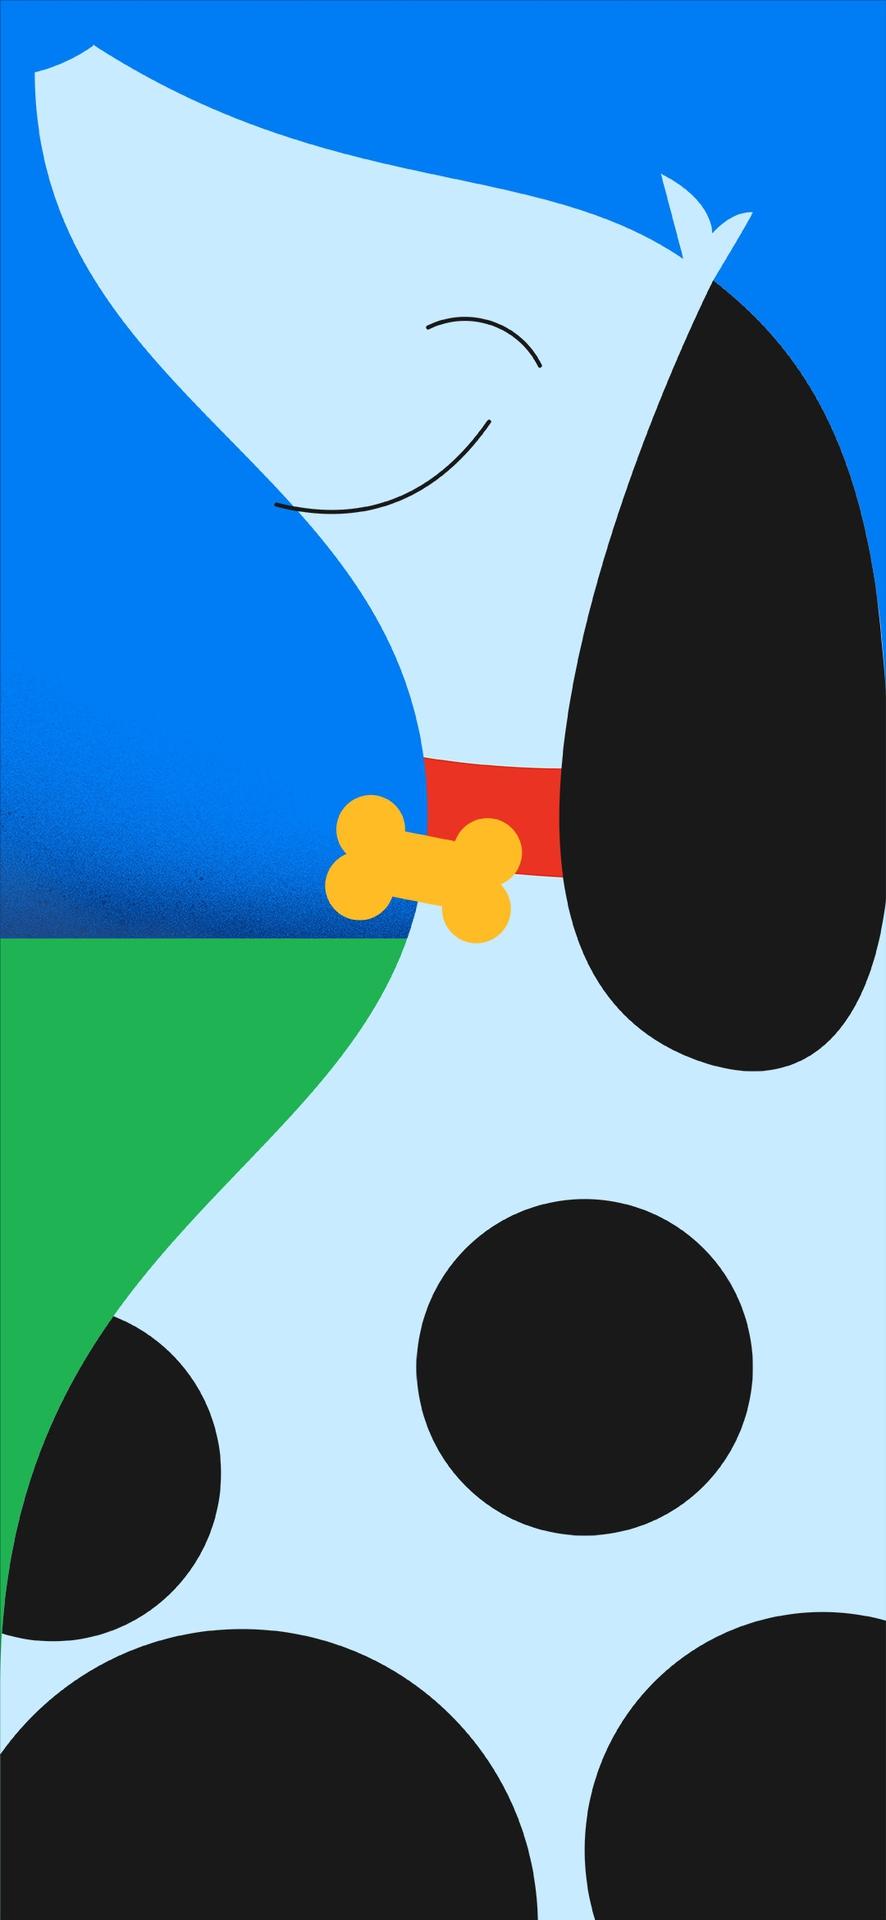 Google Pixel 4a wallpapers 5